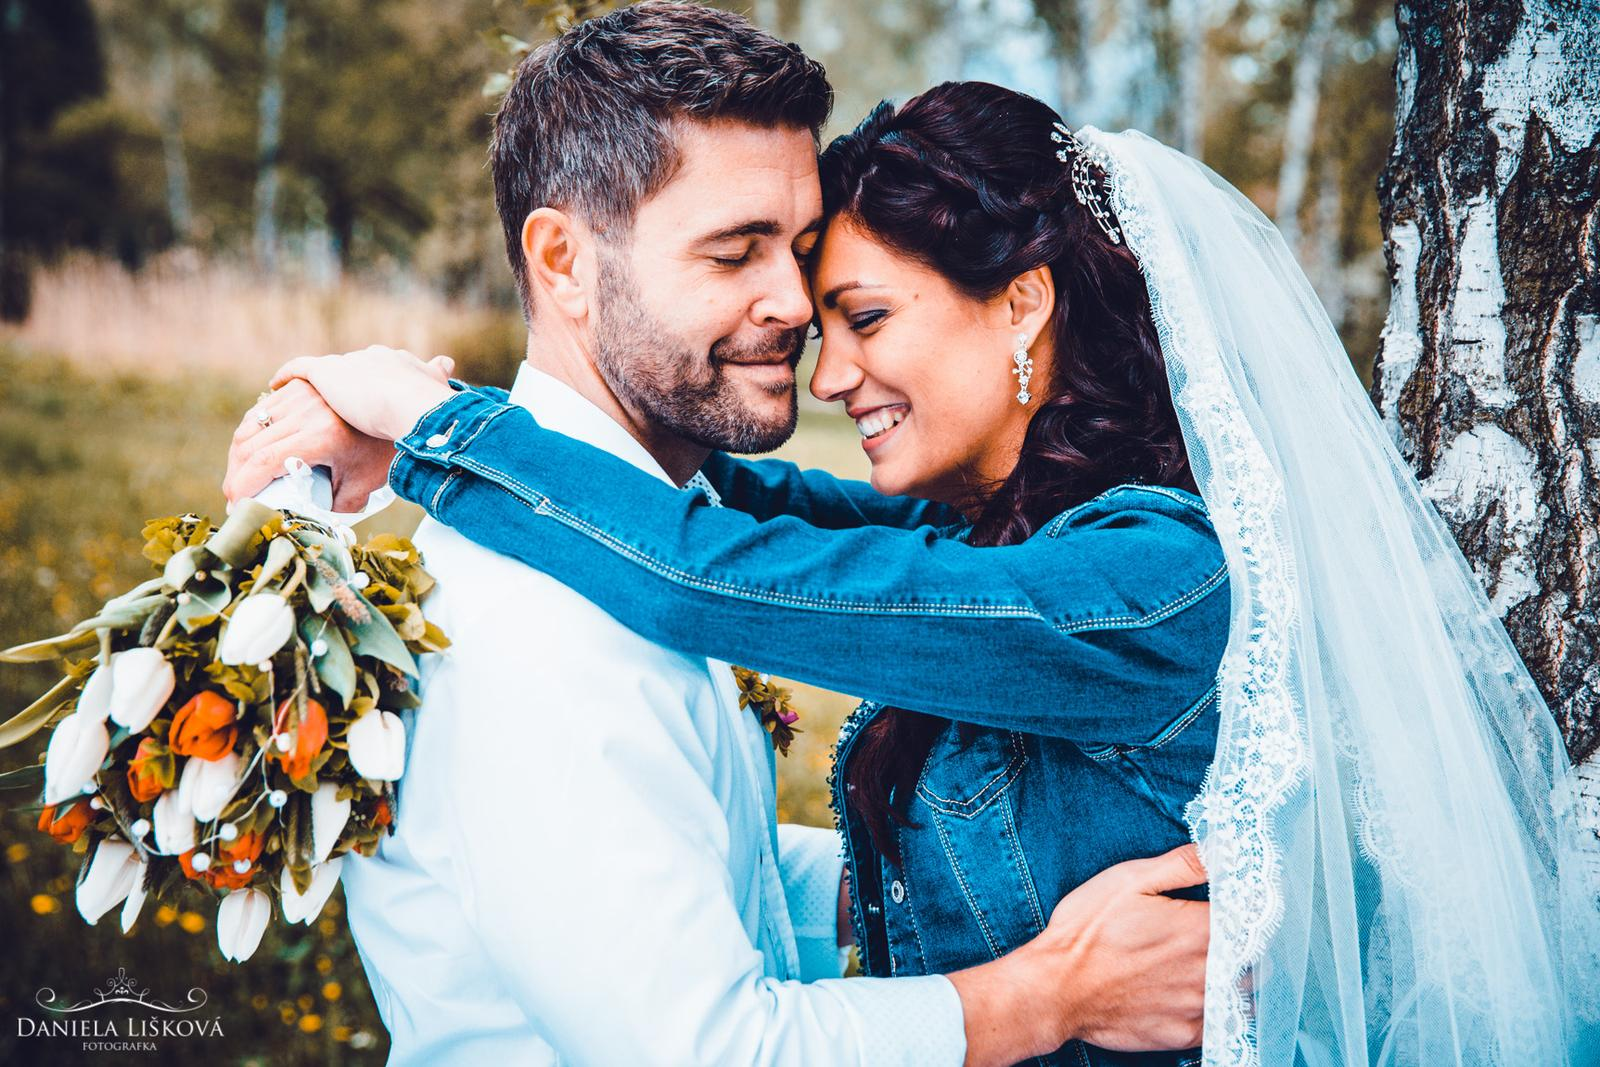 svatebni_foto_pro_vas - Svatba v lesoparku